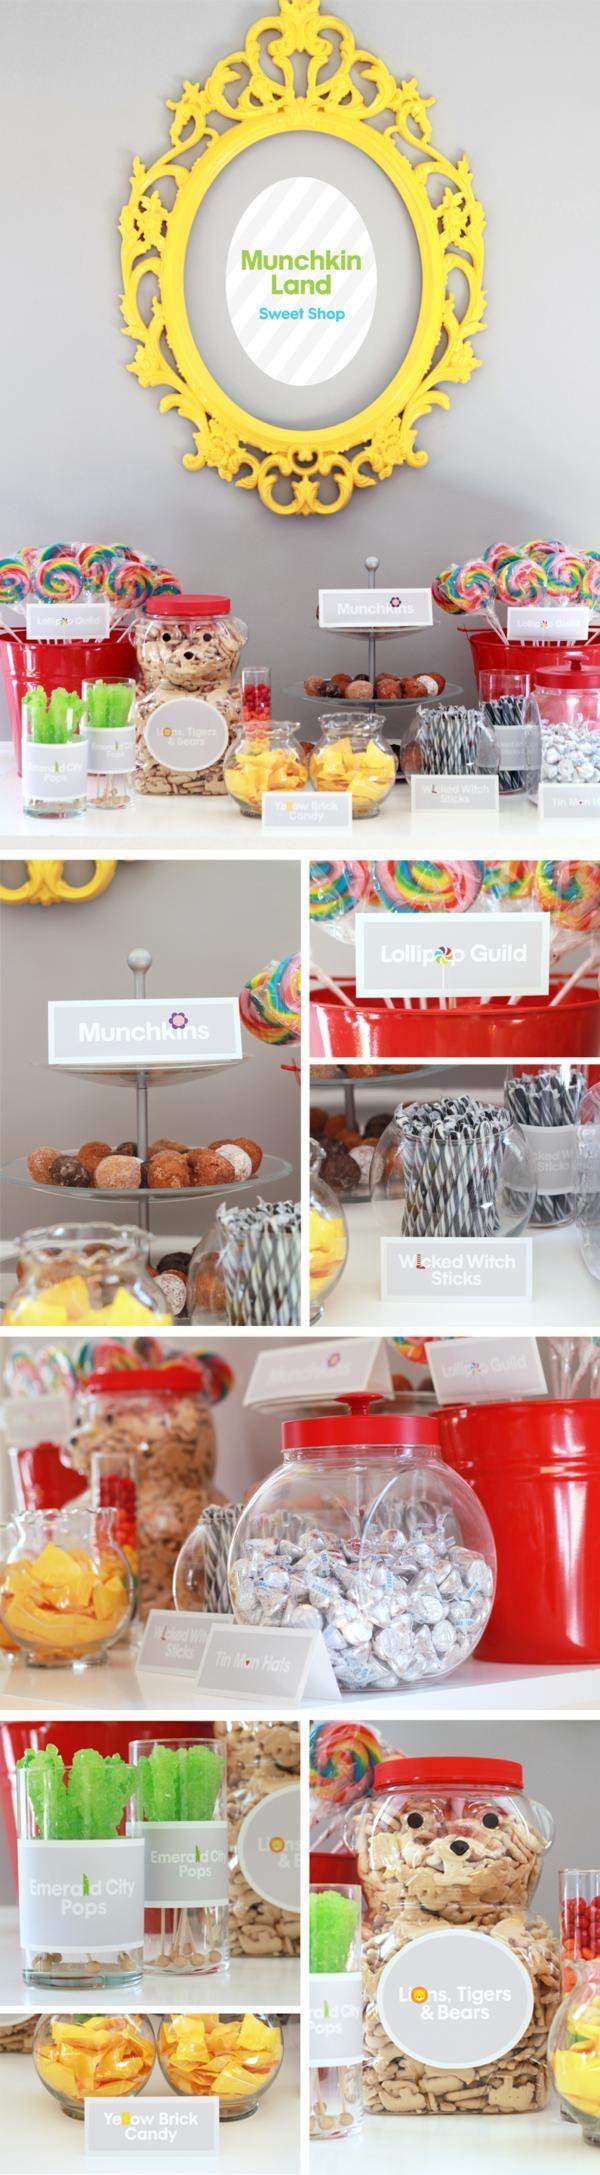 Wizard of Oz Rainbow themed birthday party via Kara's Party Ideas - www.KarasPartyIdeas.com